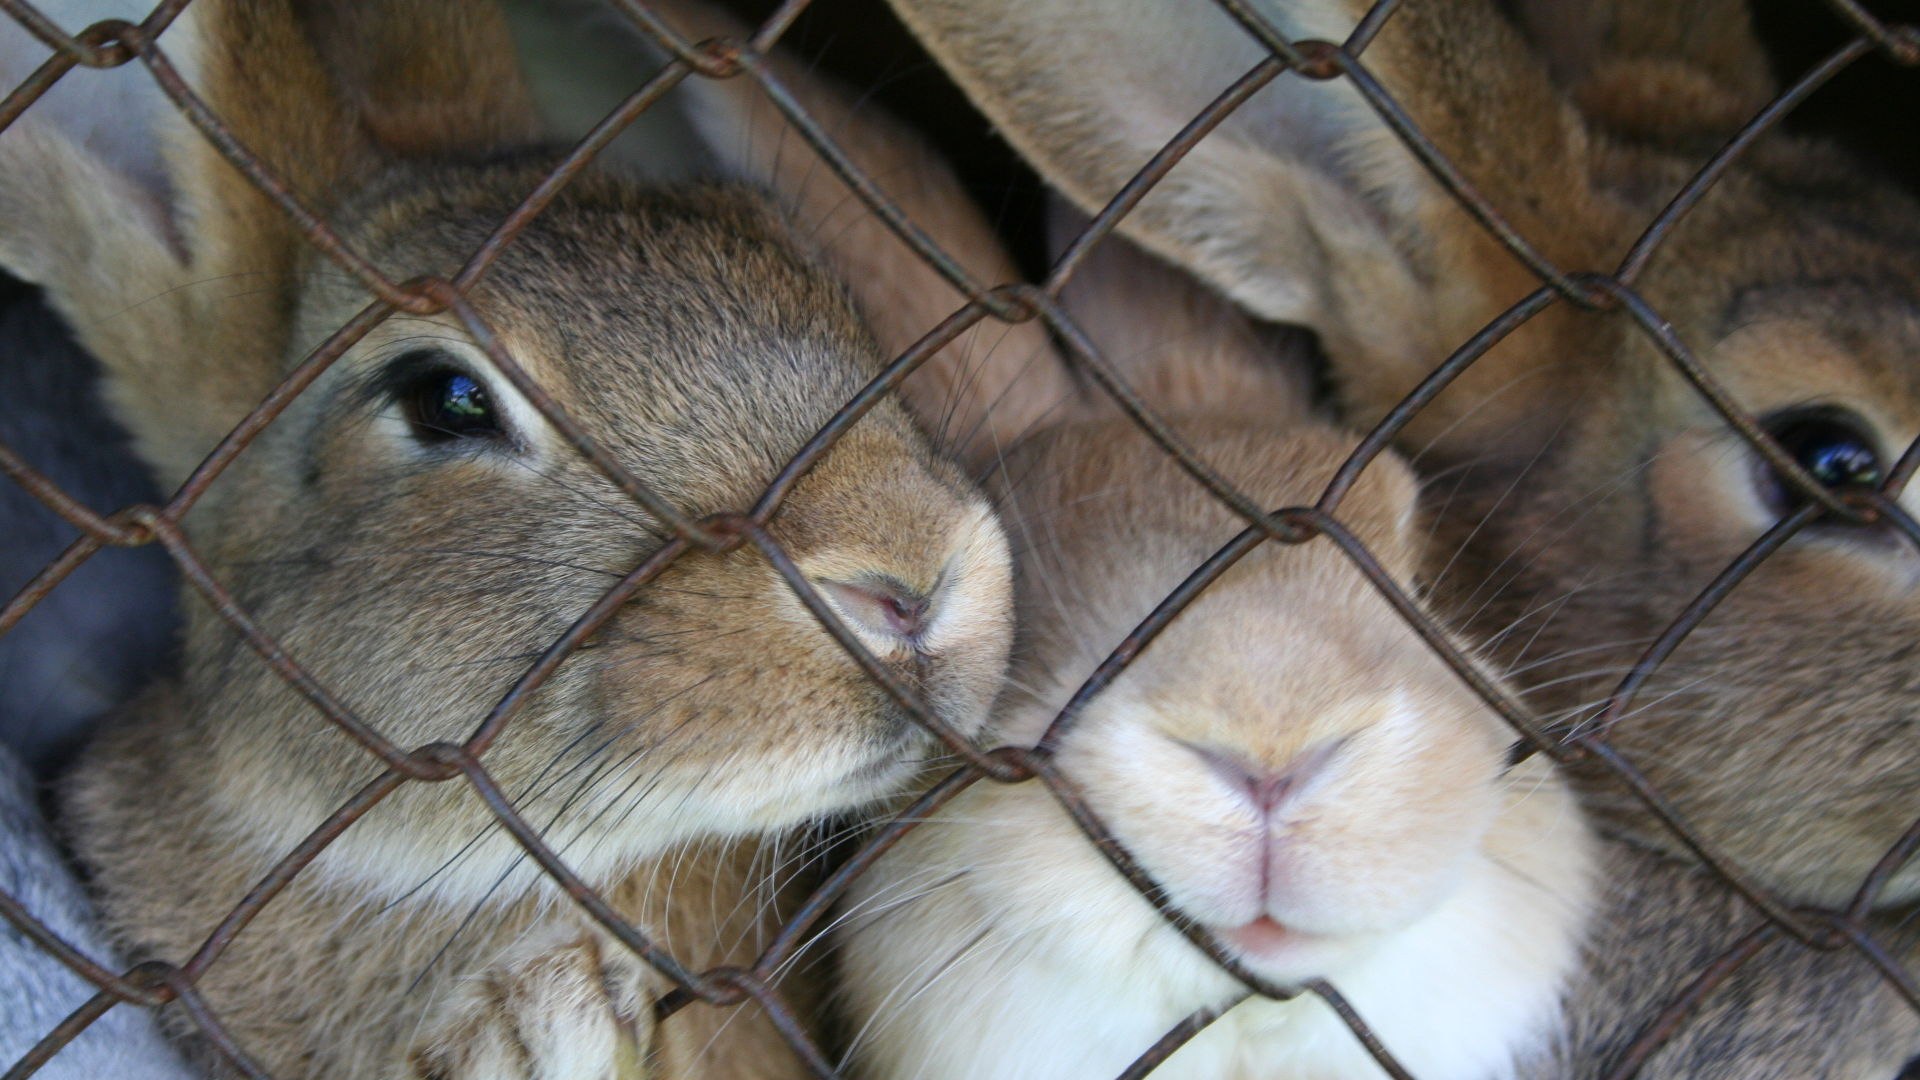 Caged rabbits. Photo credit: Nauris Mozoleff on Free Images.